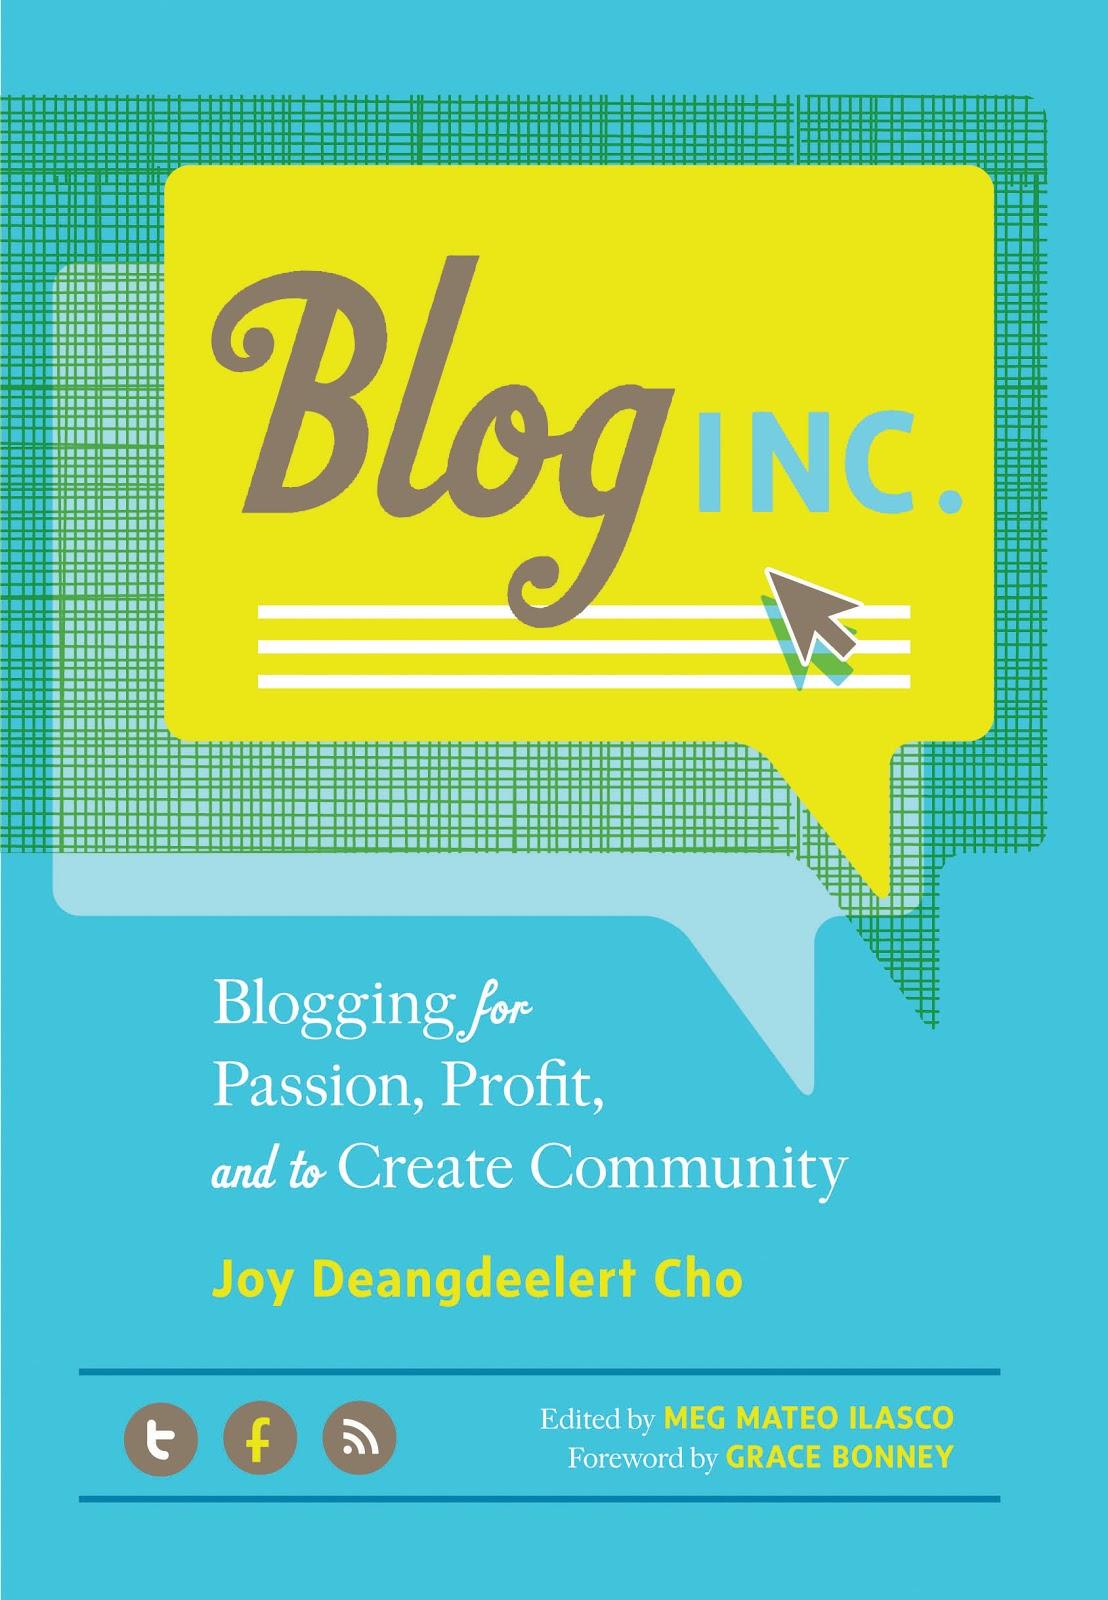 blog-inc-book-cover.jpg